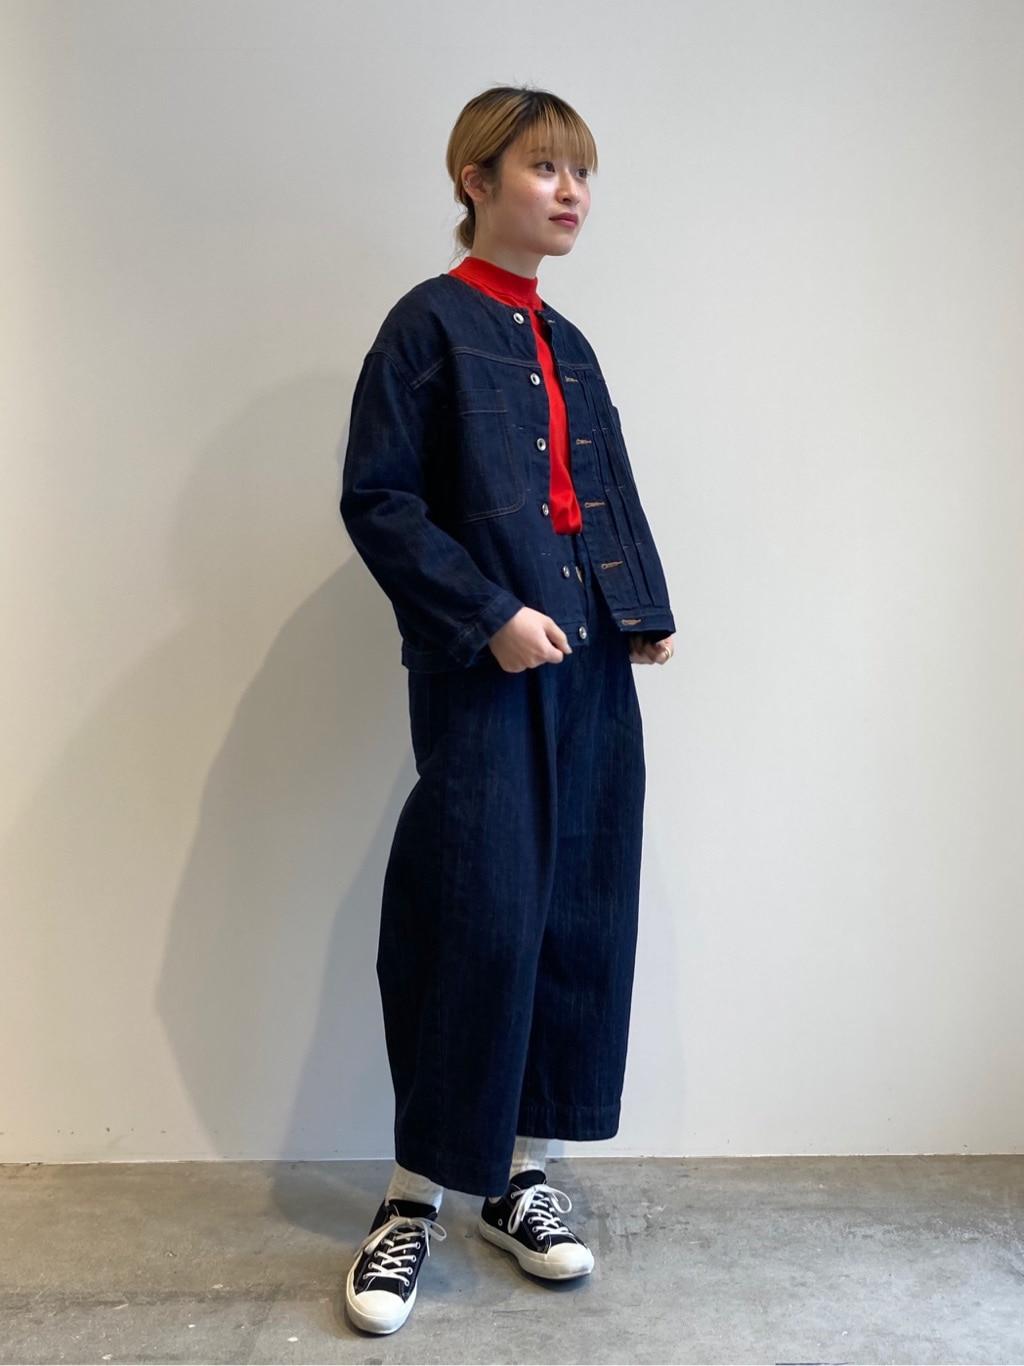 - bulle de savon FLAT AMB 名古屋栄路面 身長:162cm 2021.01.26